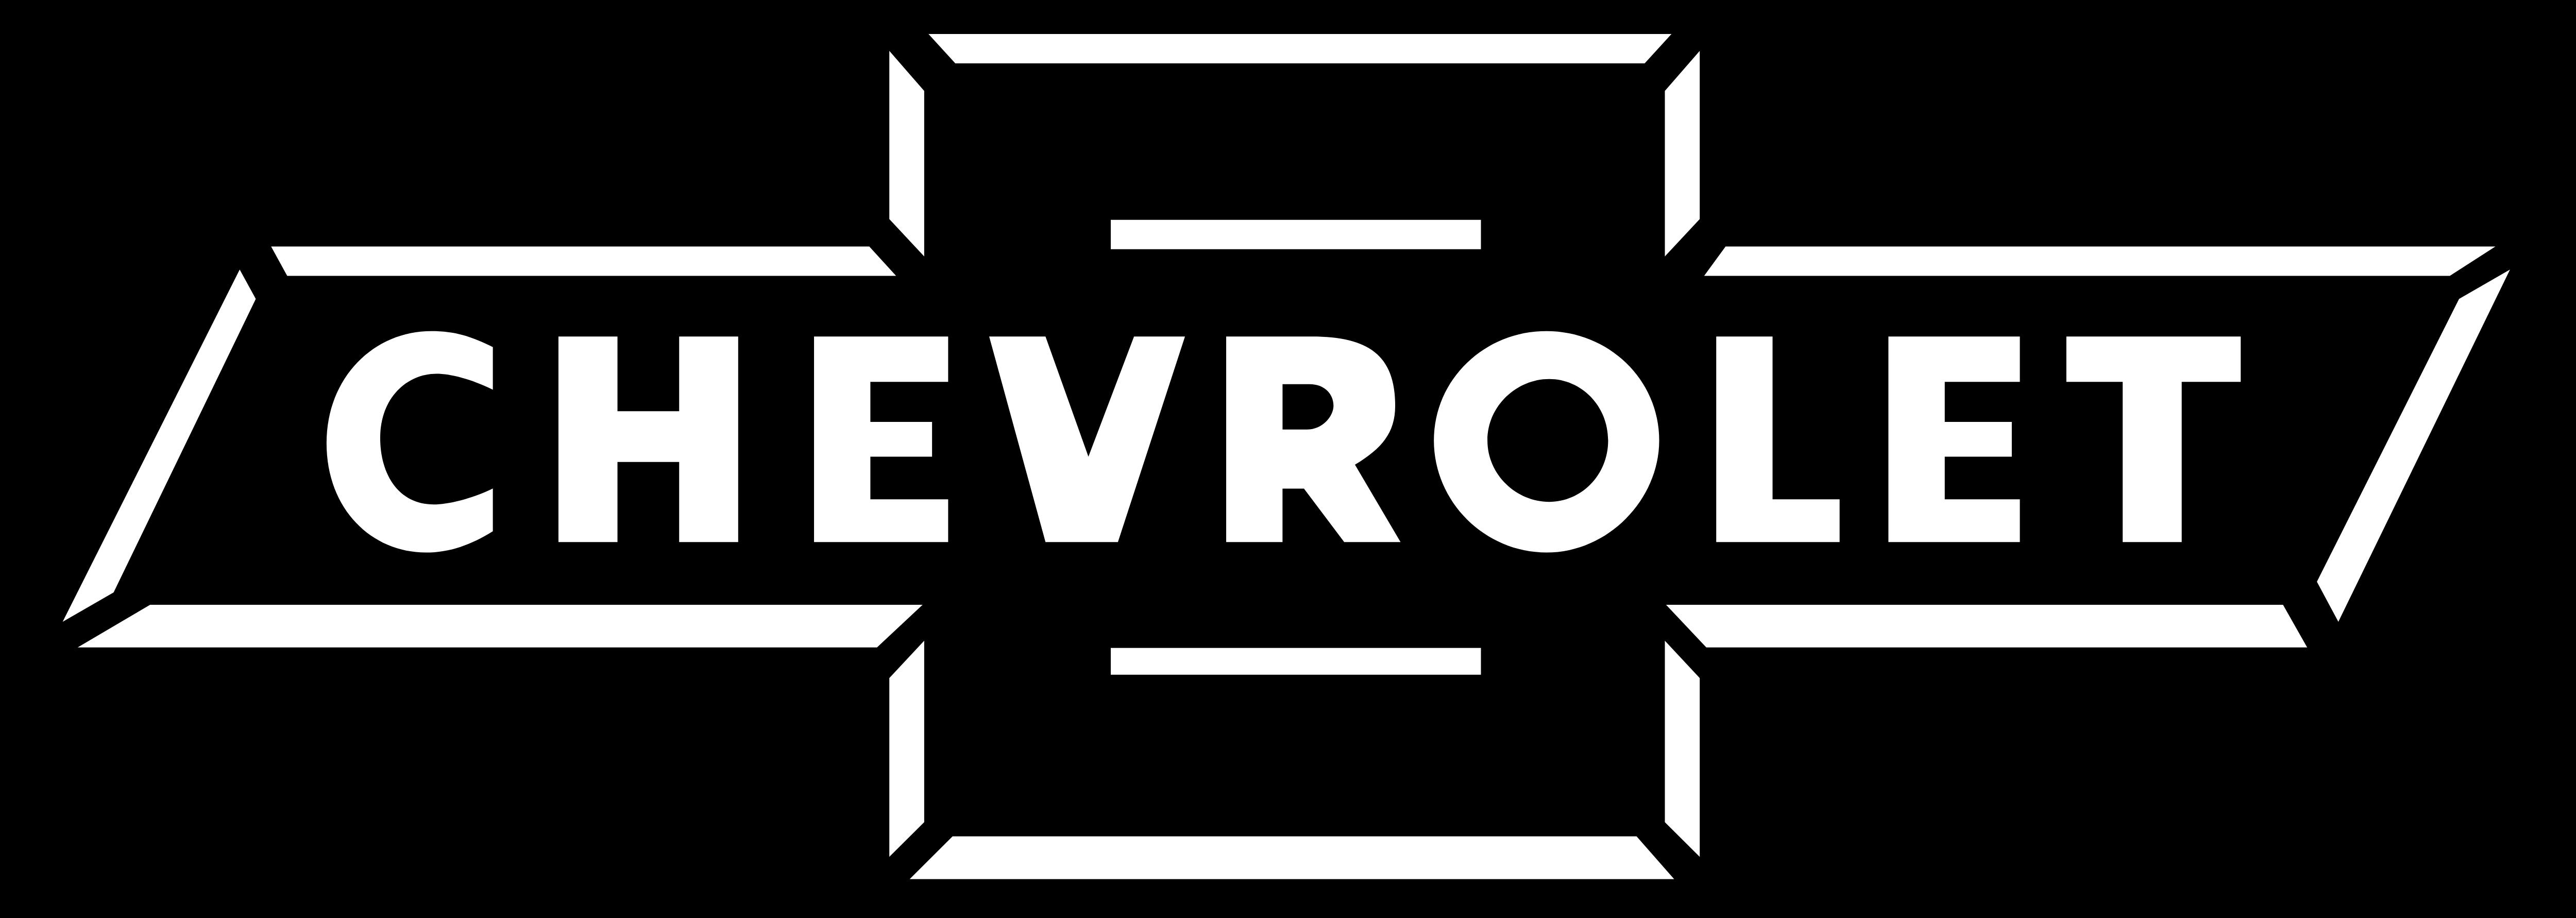 Chevrolet Logos Download Chevrolet Logo Chevrolet Emblem Prius